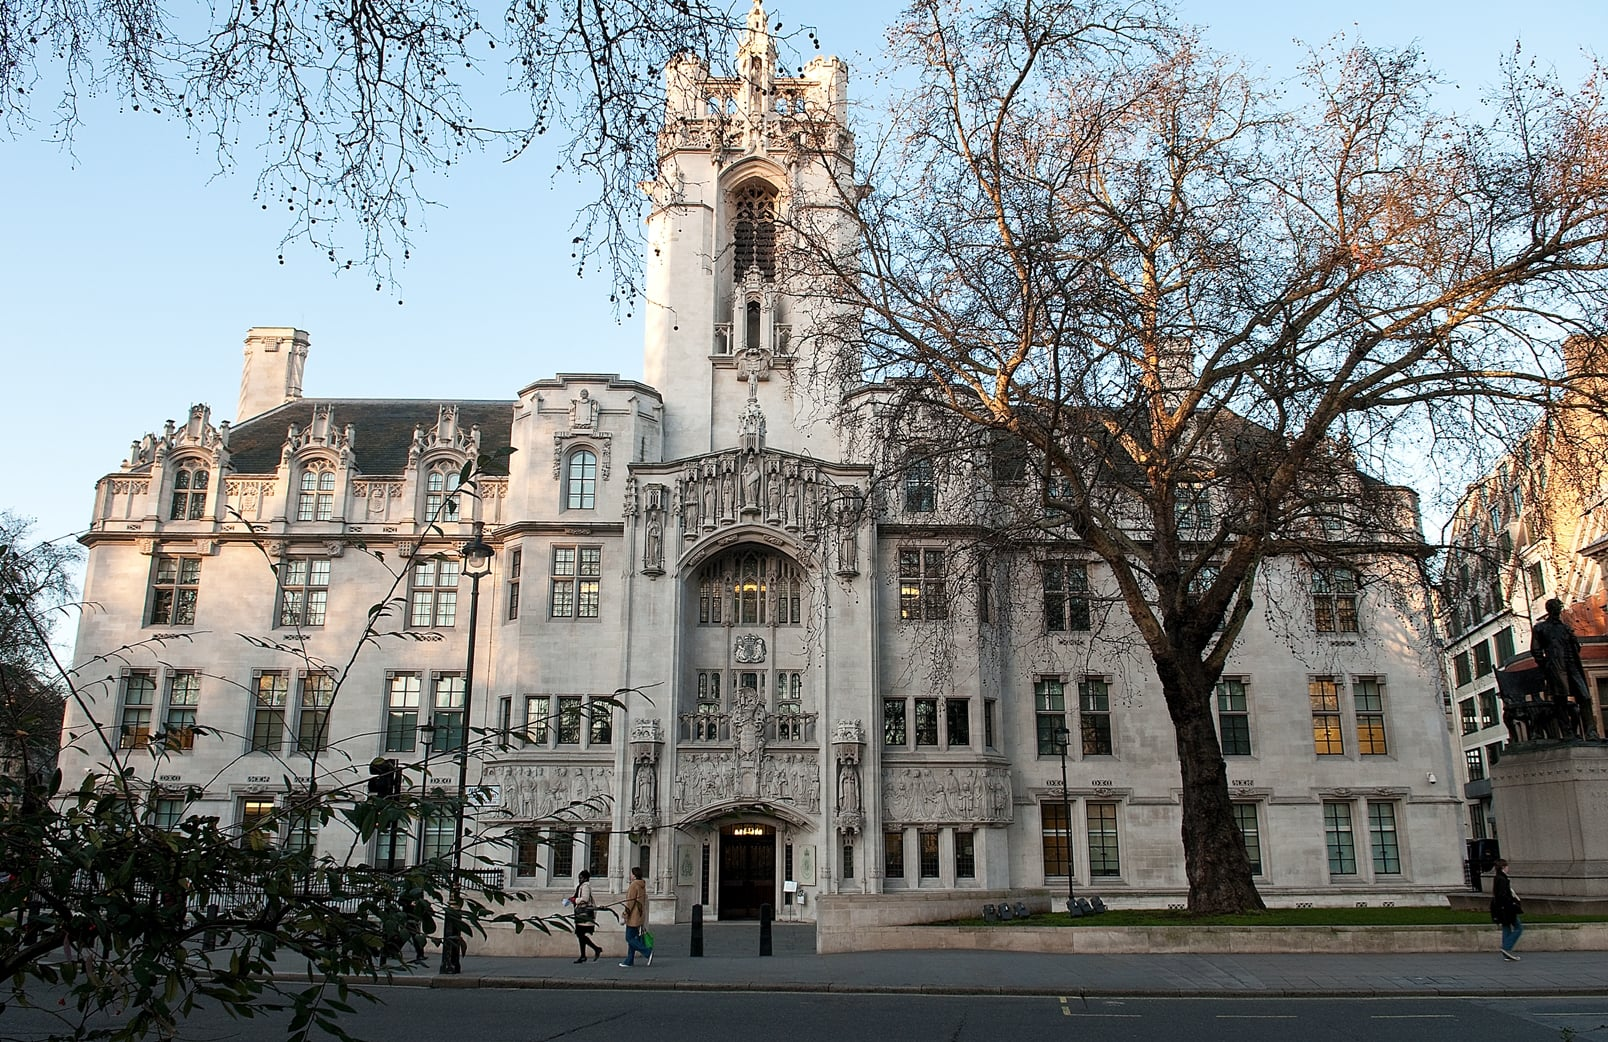 Supreme court london westminster law judges judgment thames old facade building lady hale uk